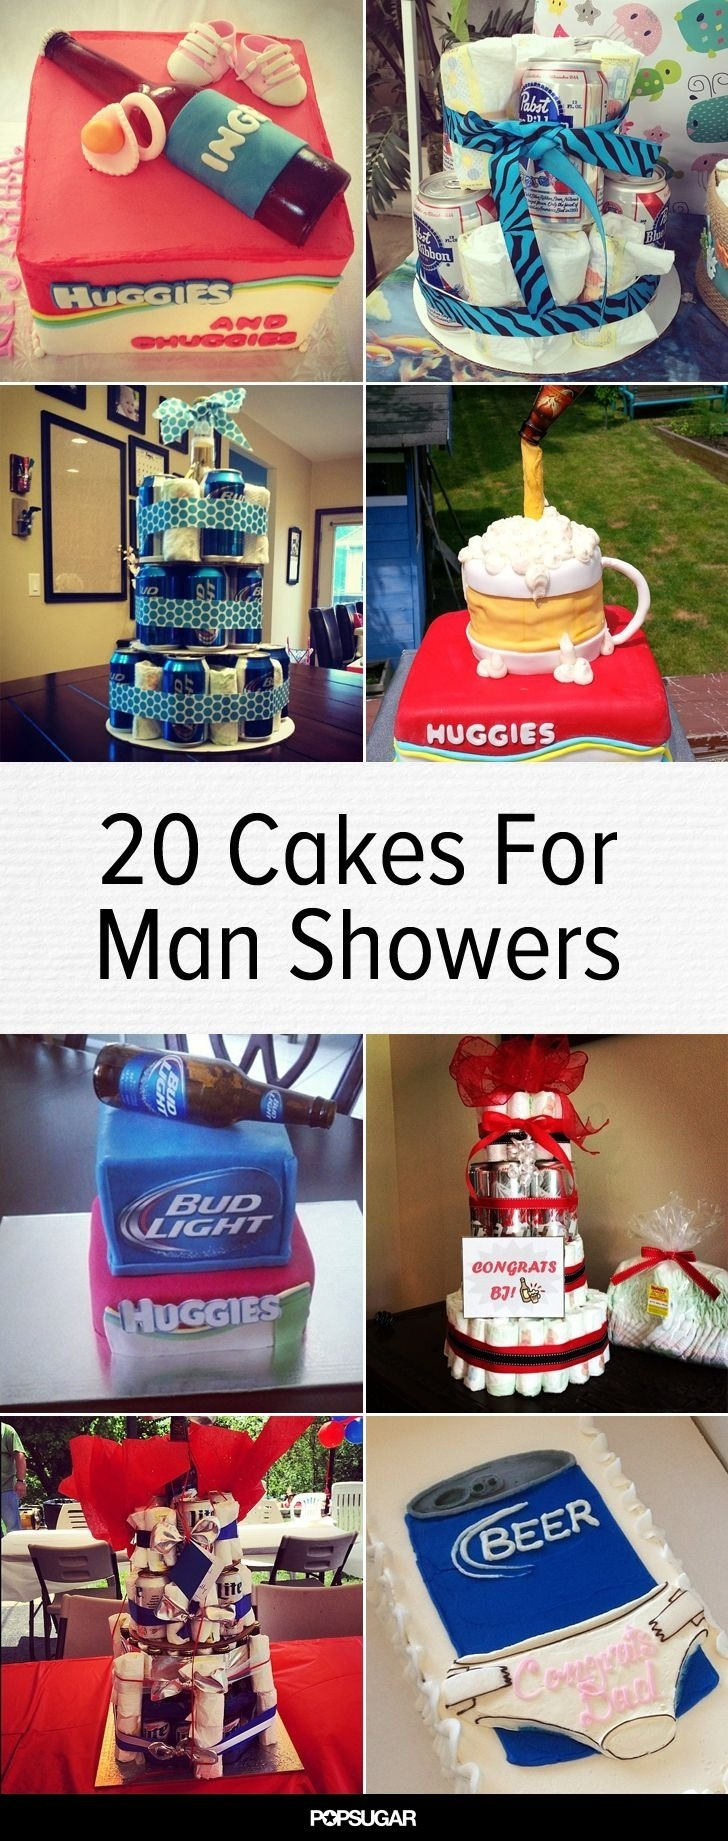 10 Elegant Diaper Party Ideas For Men 74 best beer and diaper party for men images on pinterest 2021